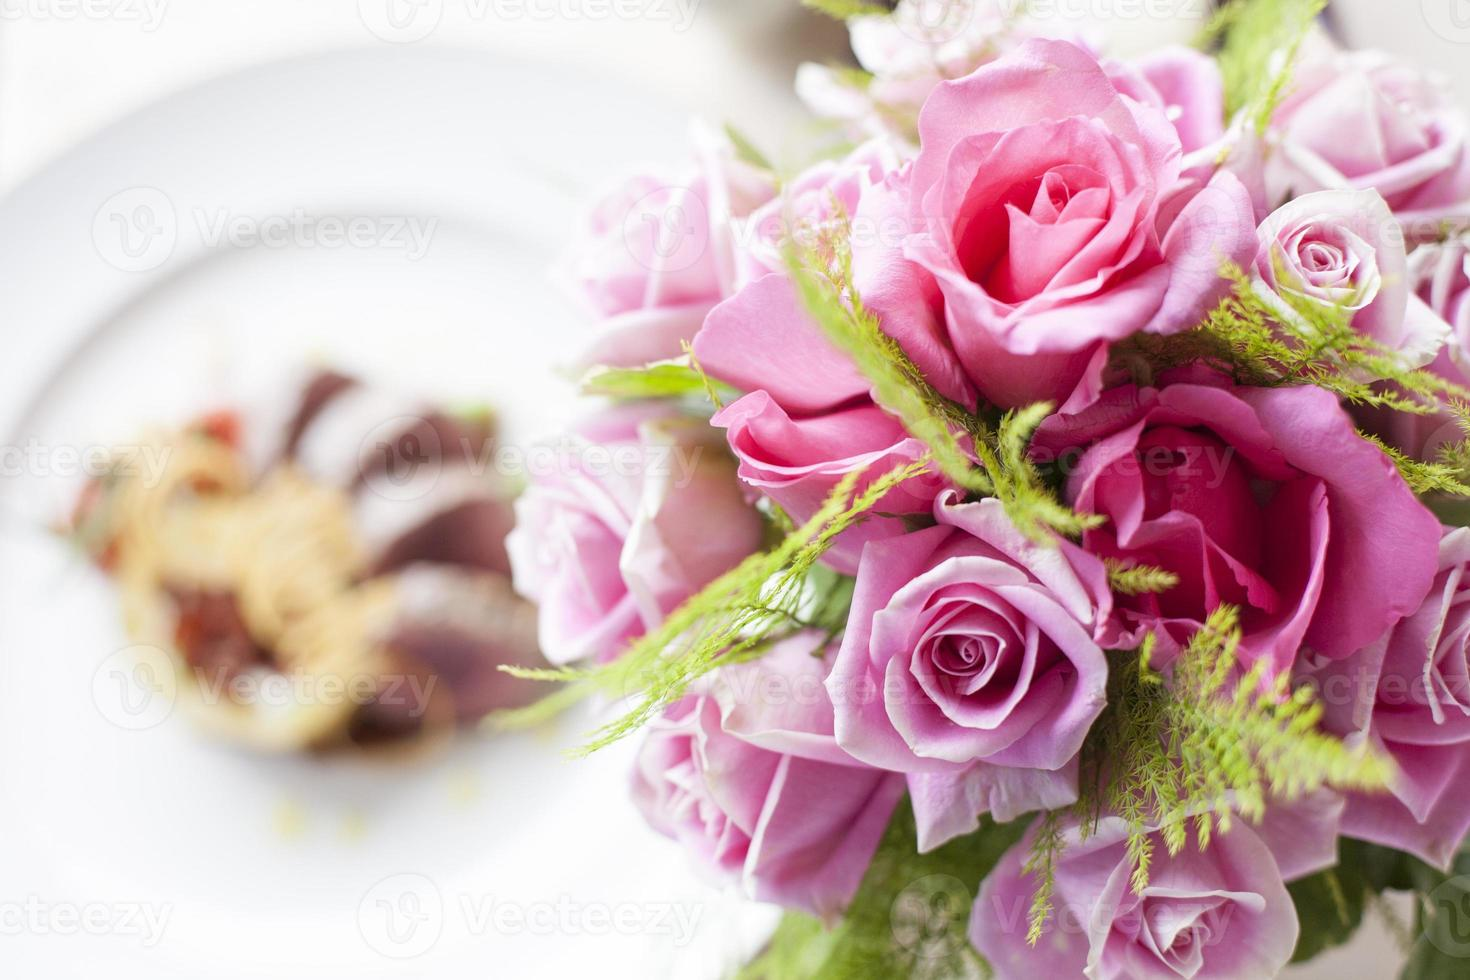 rosa Rosenblume vor Rindfleischmedaillons foto